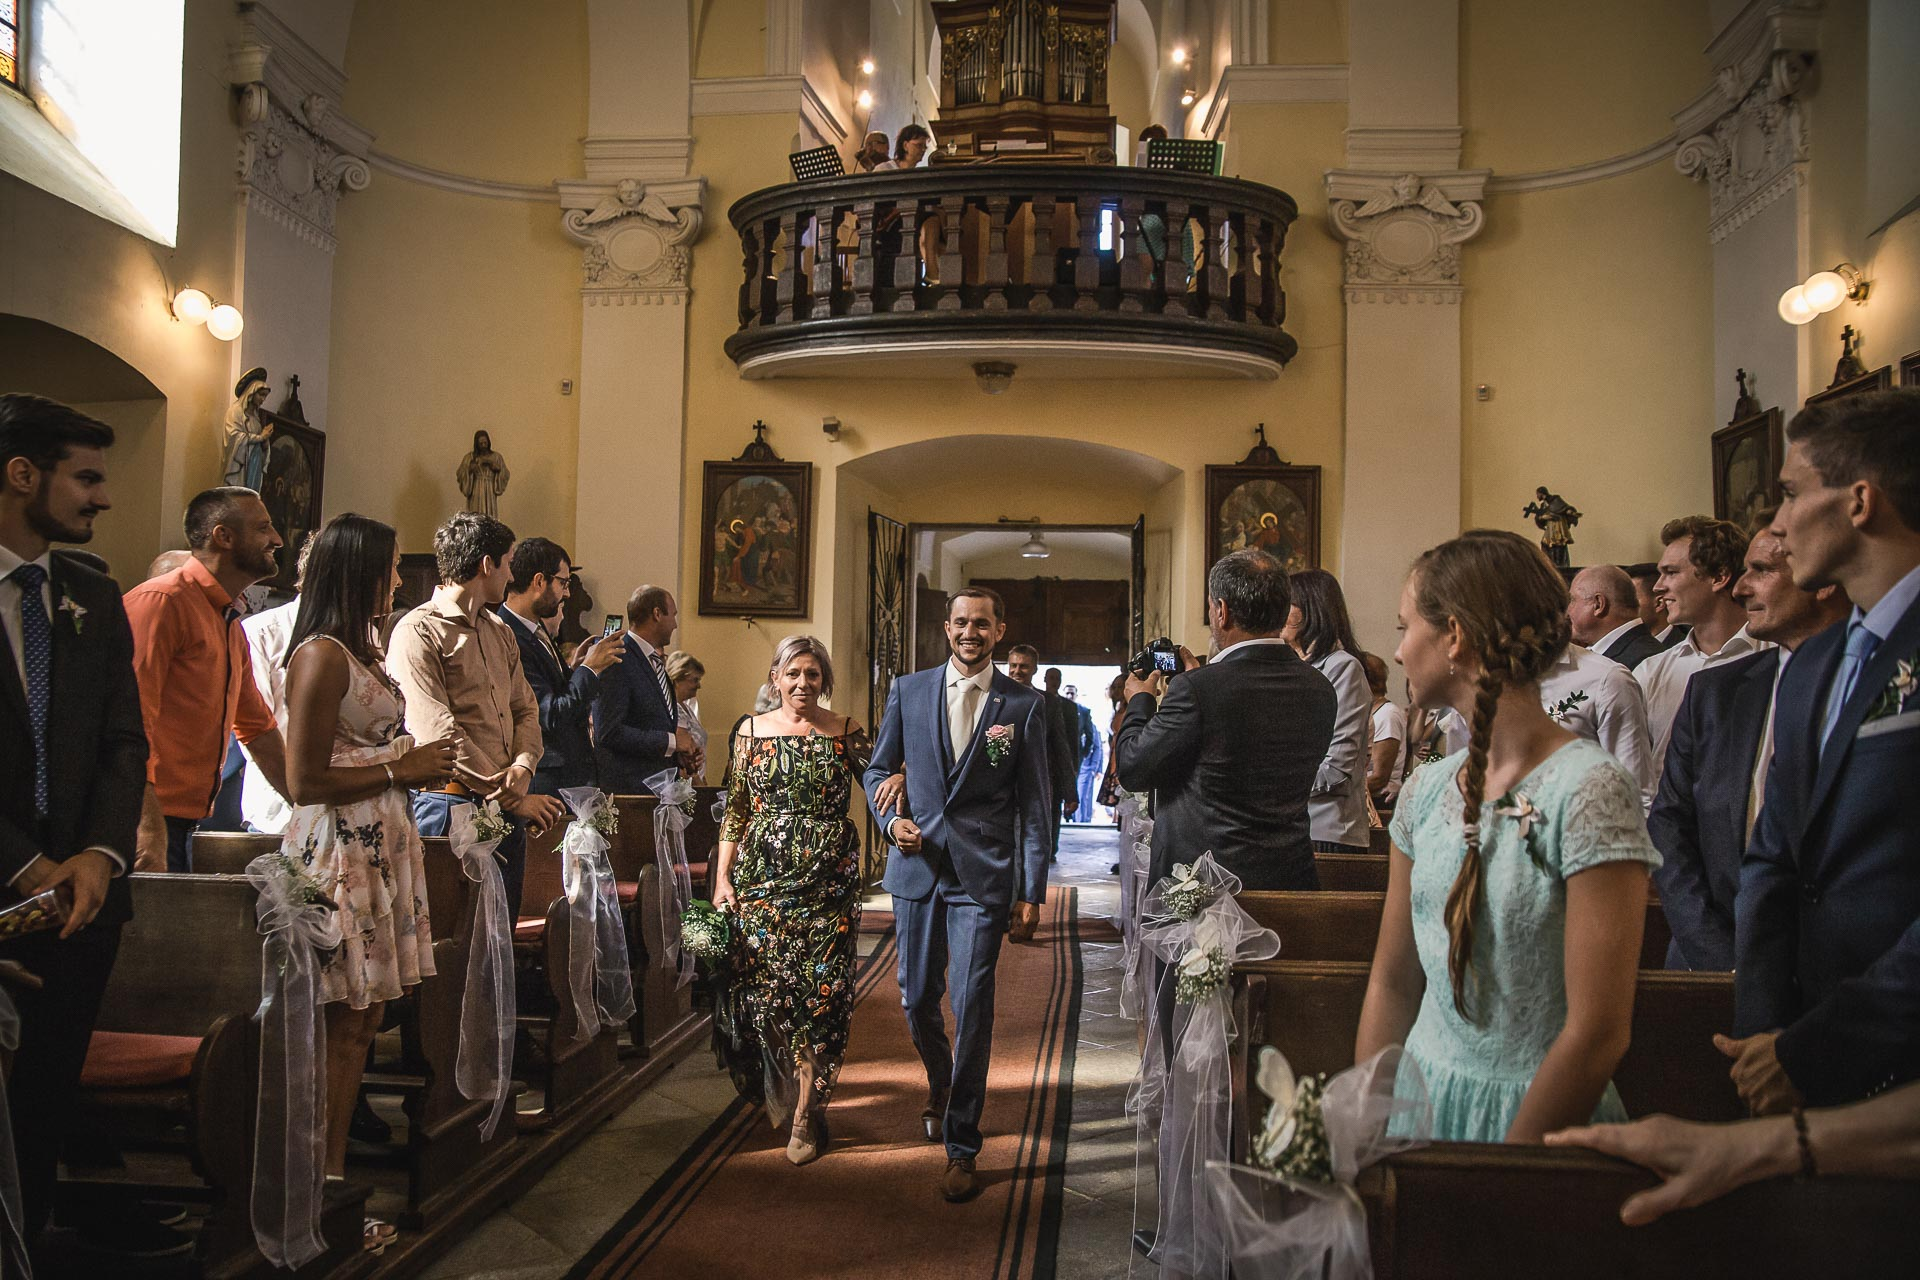 svatební-fotograf-wedding-svatebni-video-orlík-vltava-kostel-statek-stodola-boho-svatba-Beautyfoto-179